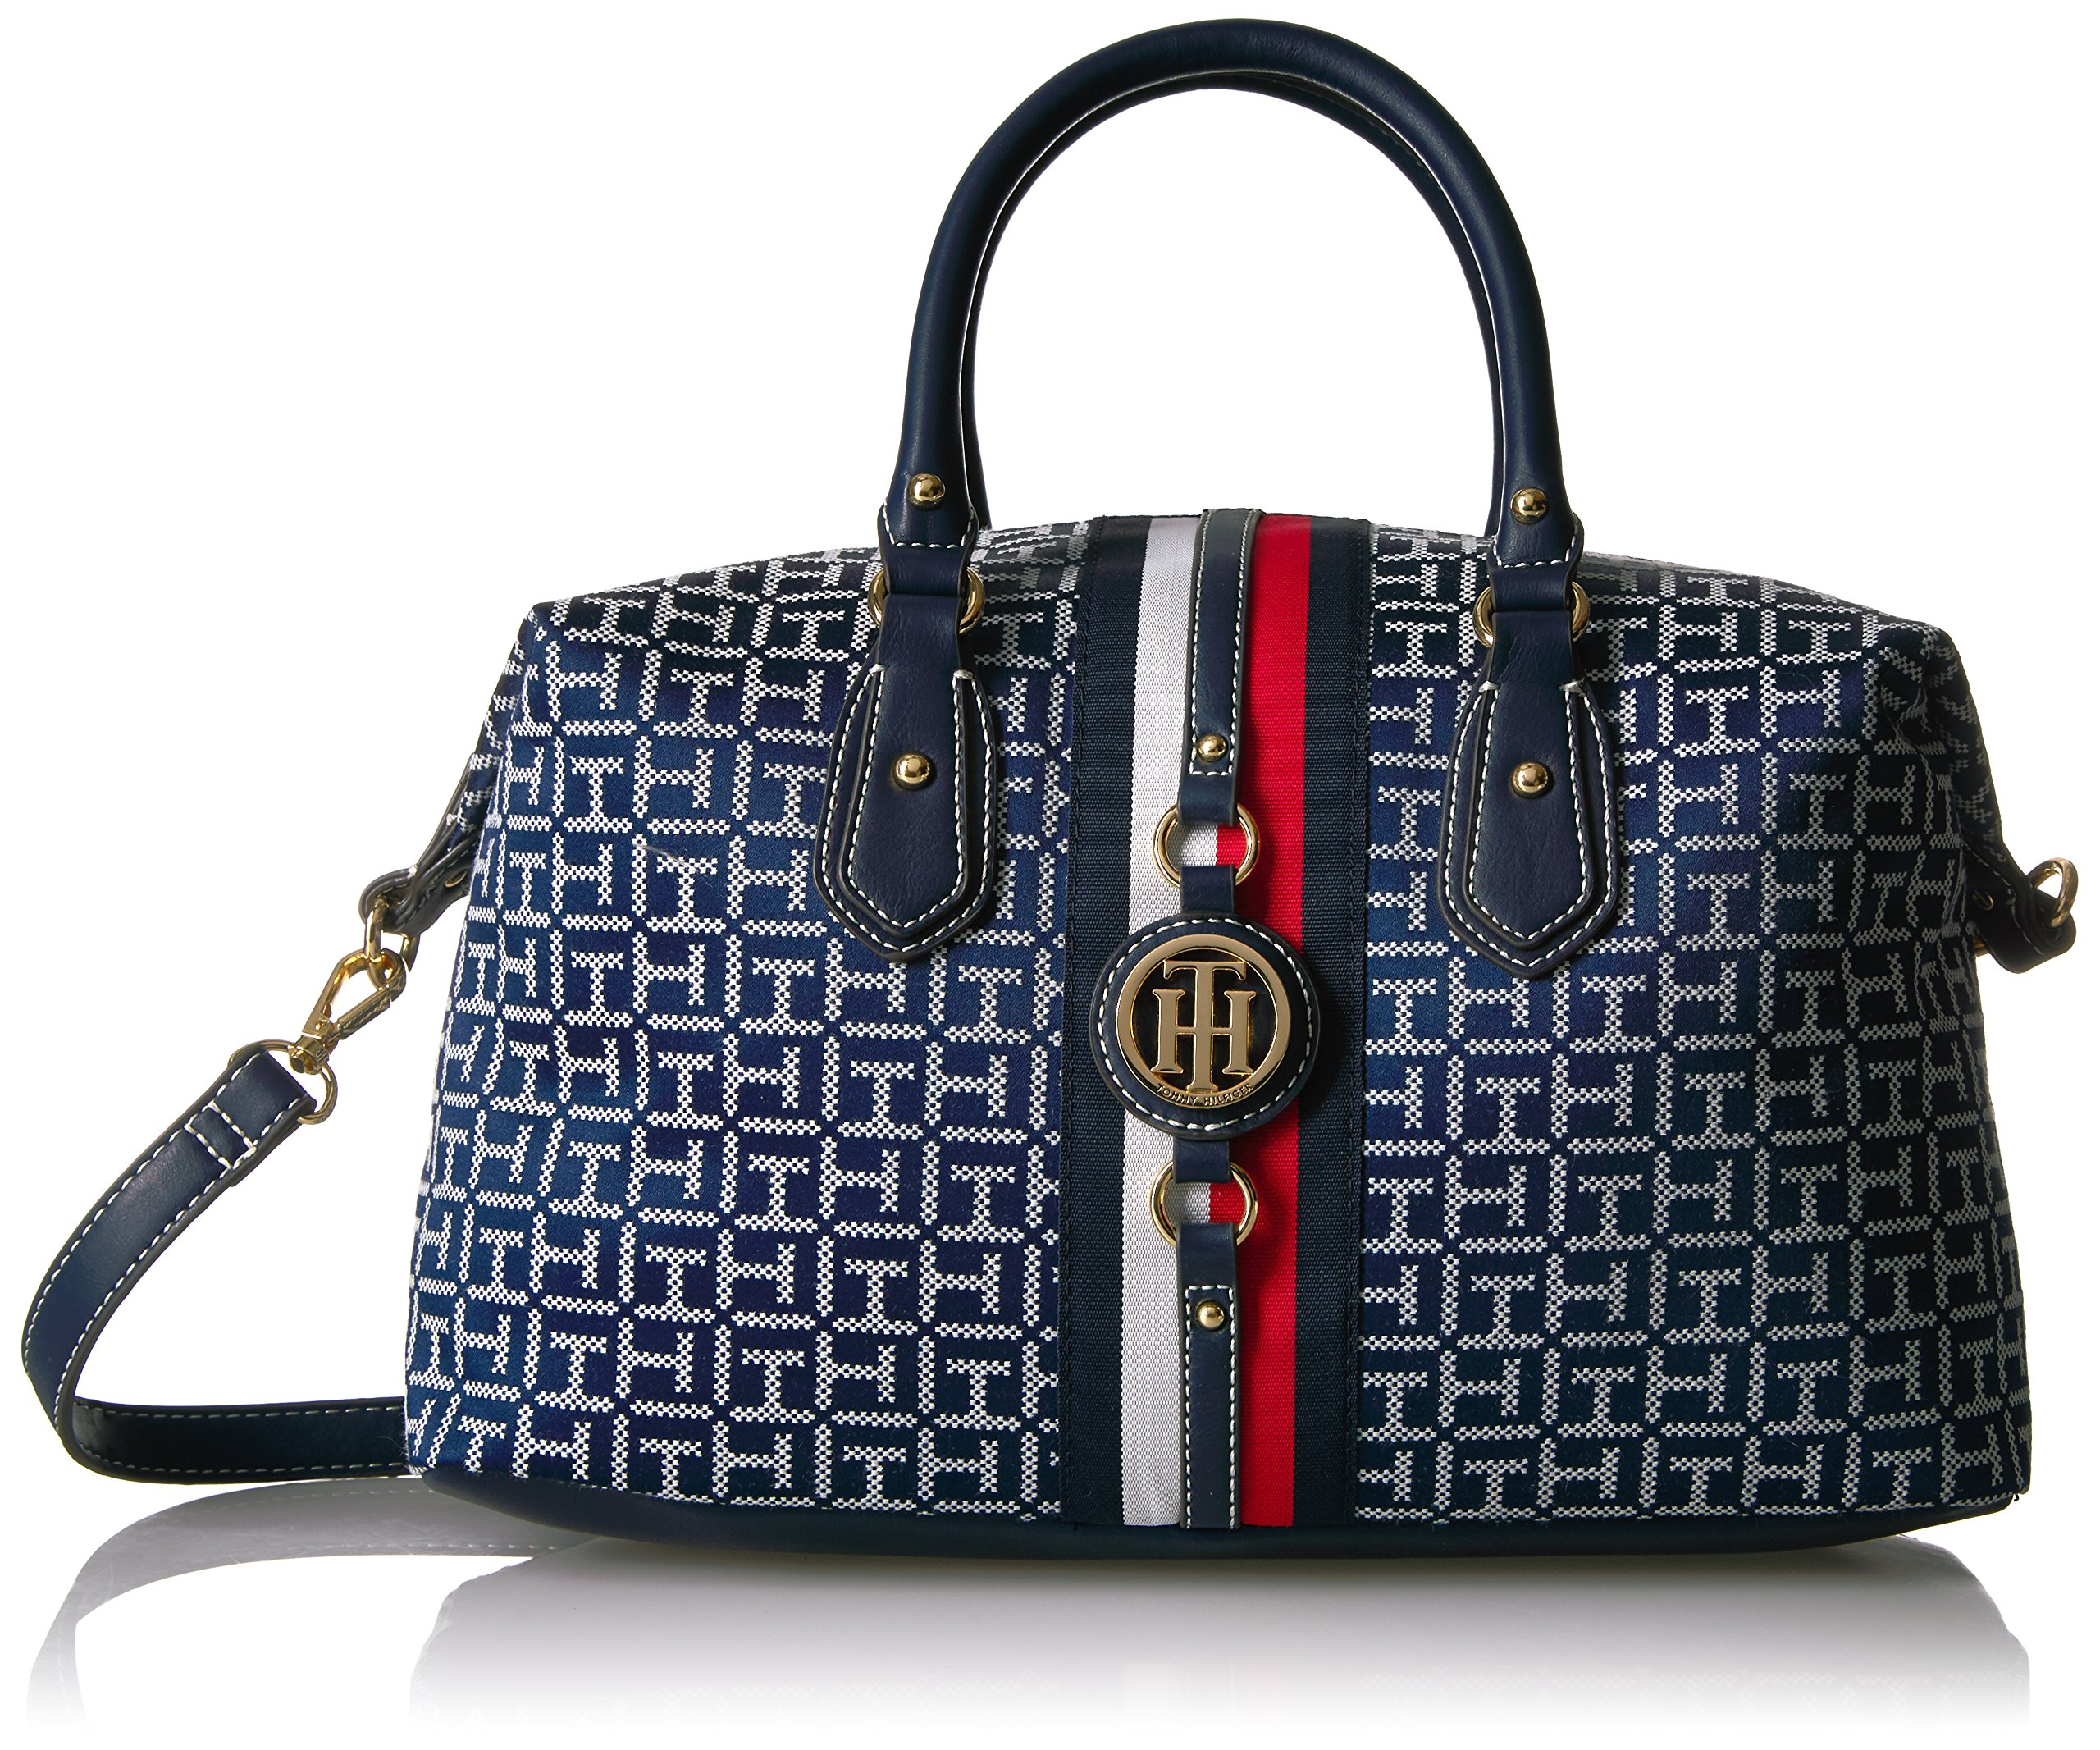 Tommy Hilfiger Handbag for Women Jaden Satchel, Navy/White by Tommy Hilfiger (Image #1)